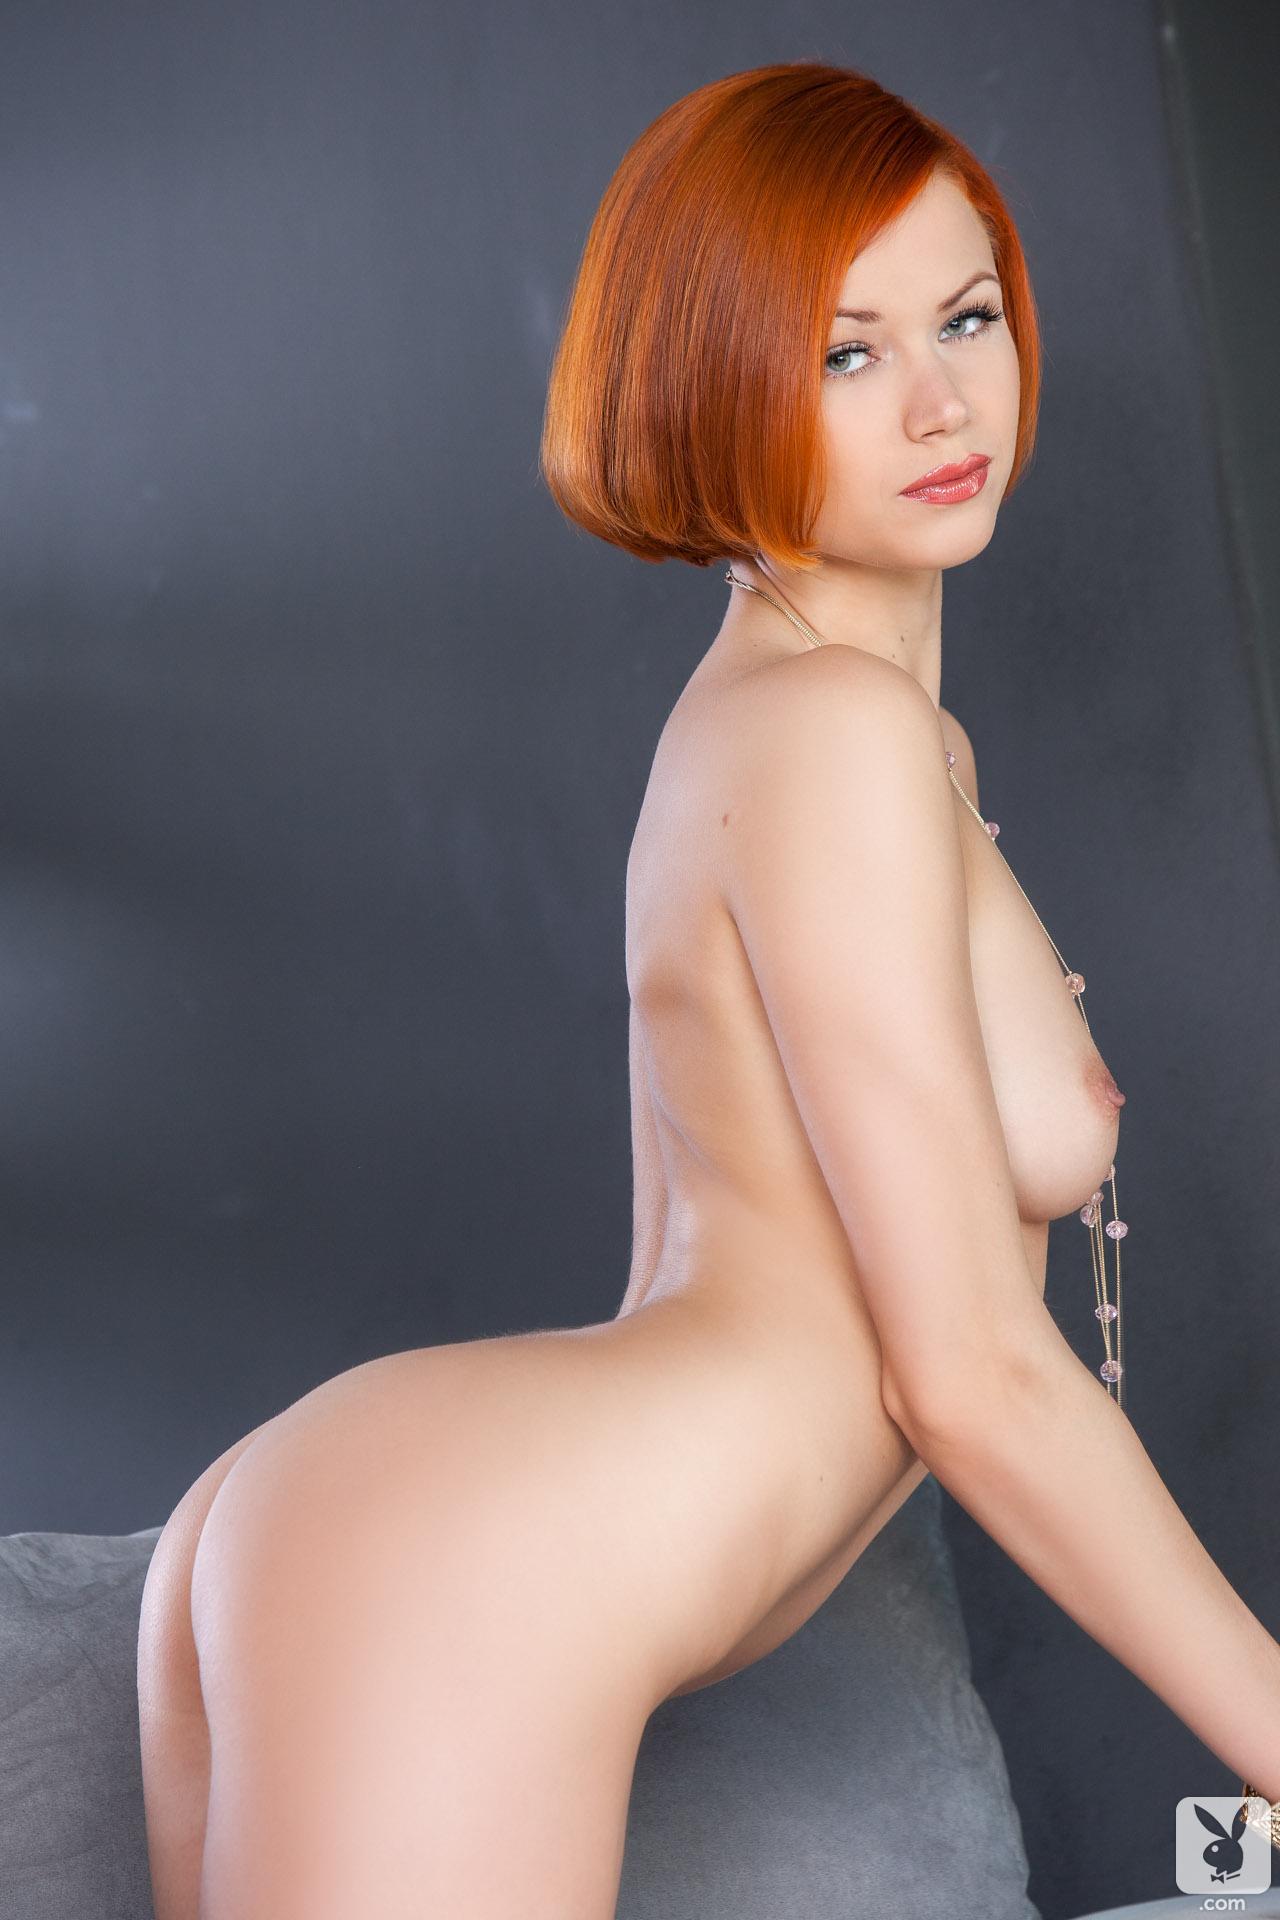 kamila-hermanova-redhead-naked-white-lingerie-playboy-28